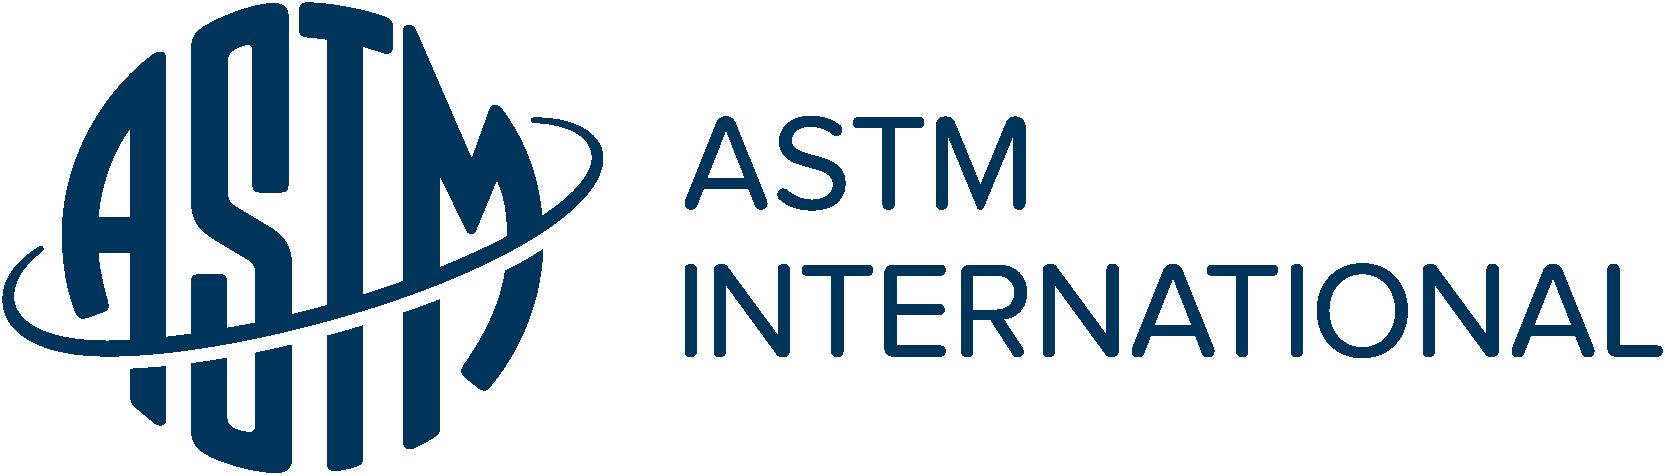 logo_of_astm_international_oct_2015